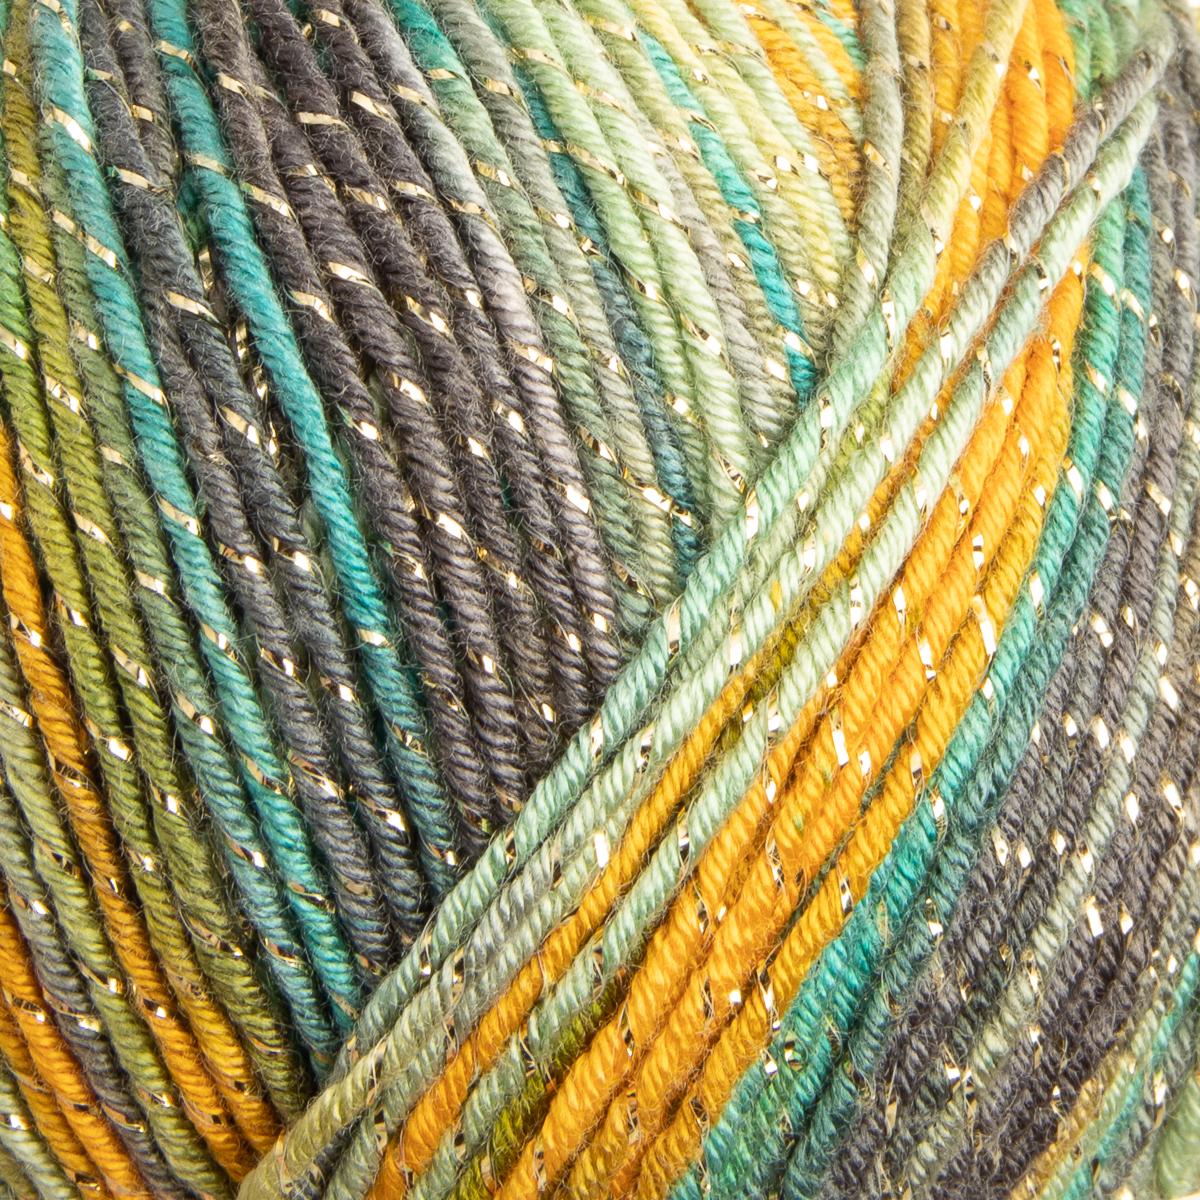 3pk-Premier-Yarns-Wool-Free-Lace-Acrylic-Yarn-Super-Fine-1-Knitting-Skeins-Soft thumbnail 17